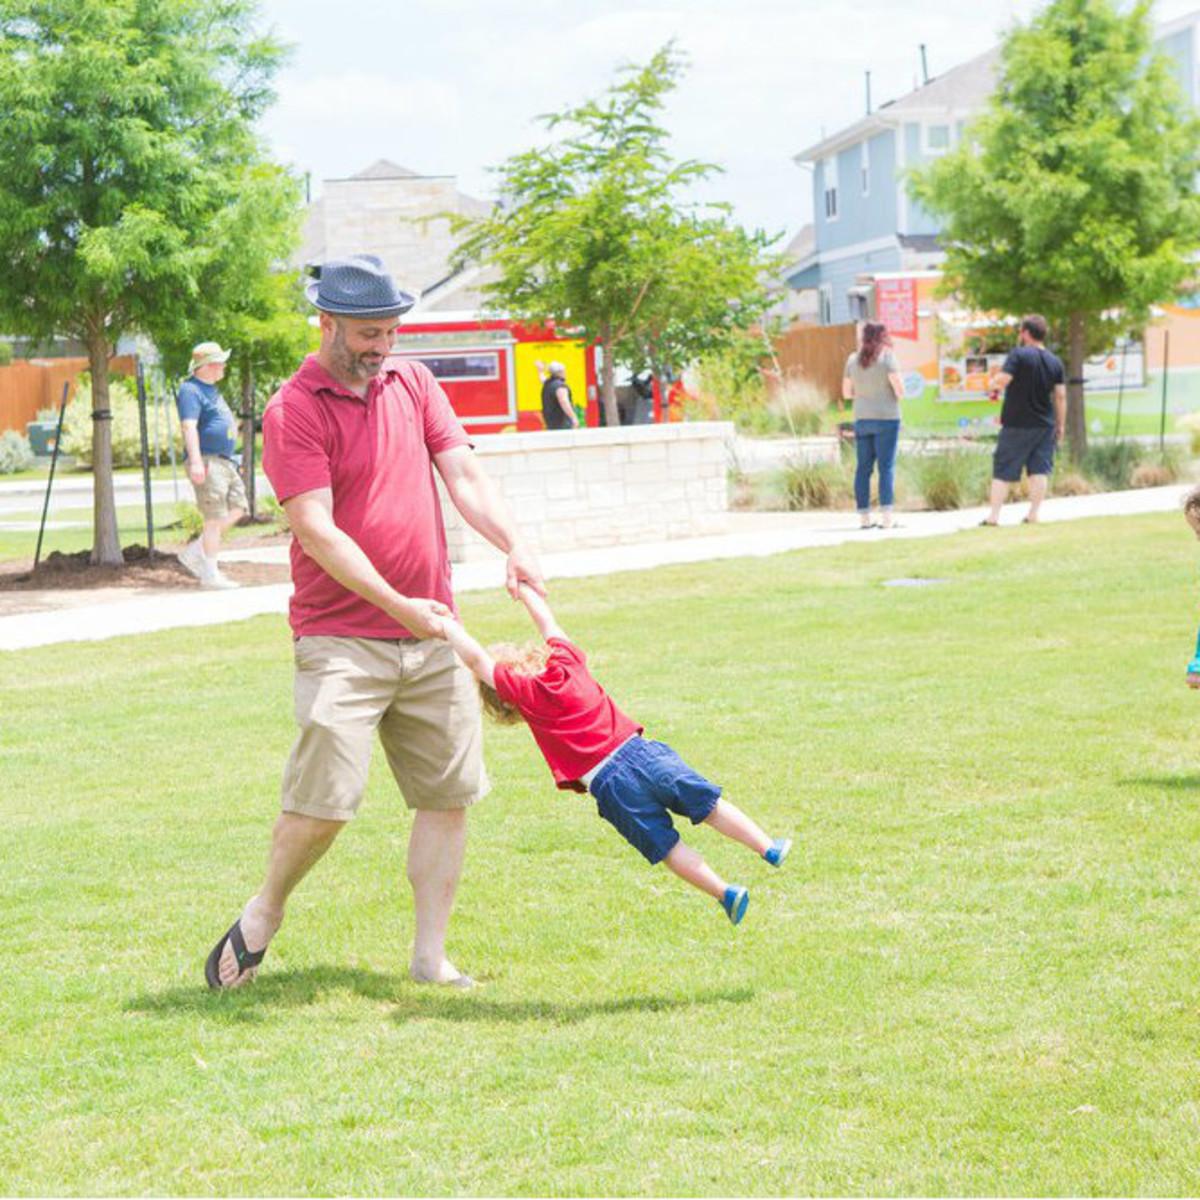 Easton Park dad son kida playing park